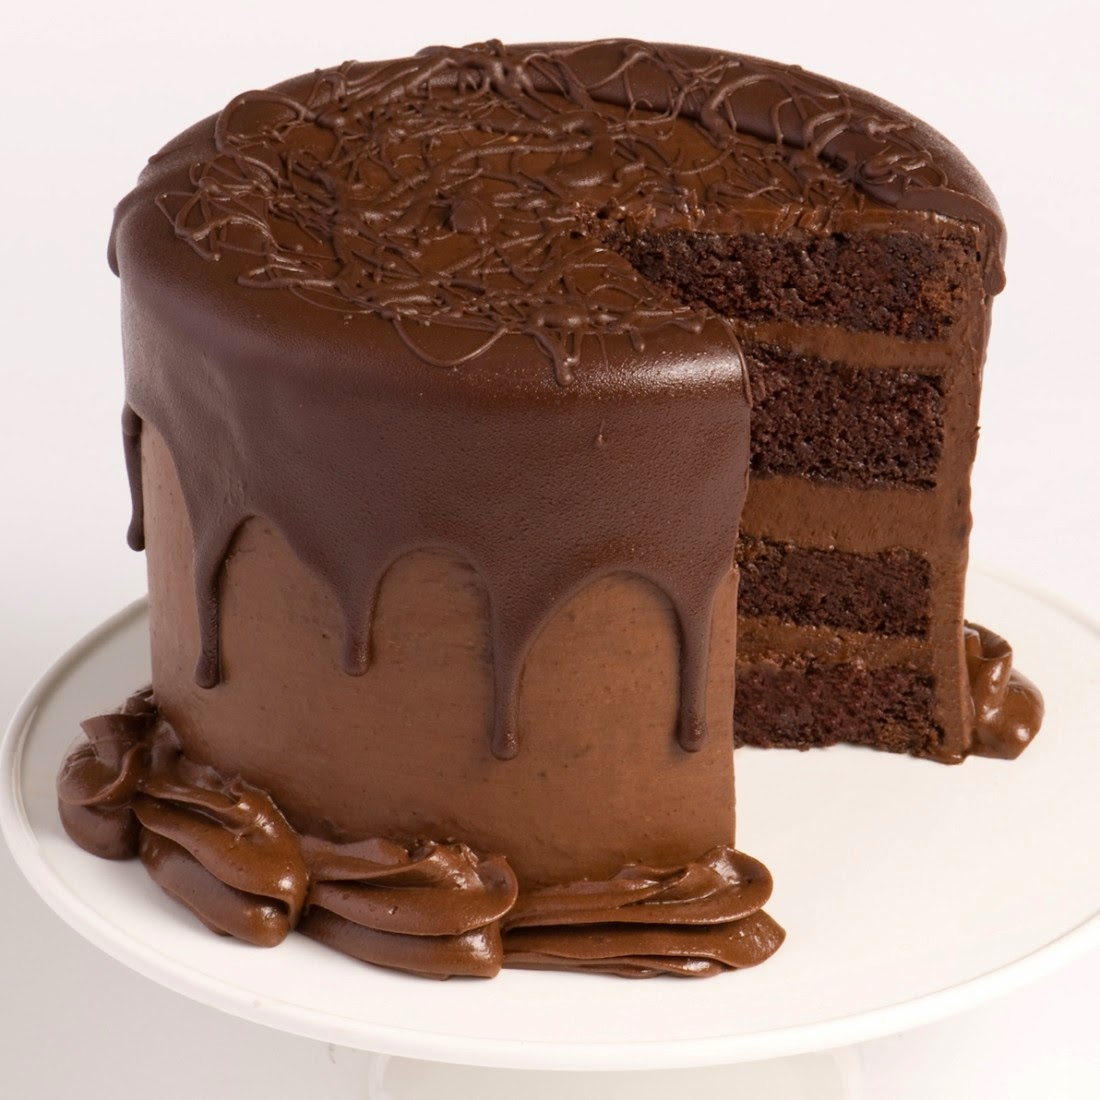 Award Winning Cake Recipes From Scratch